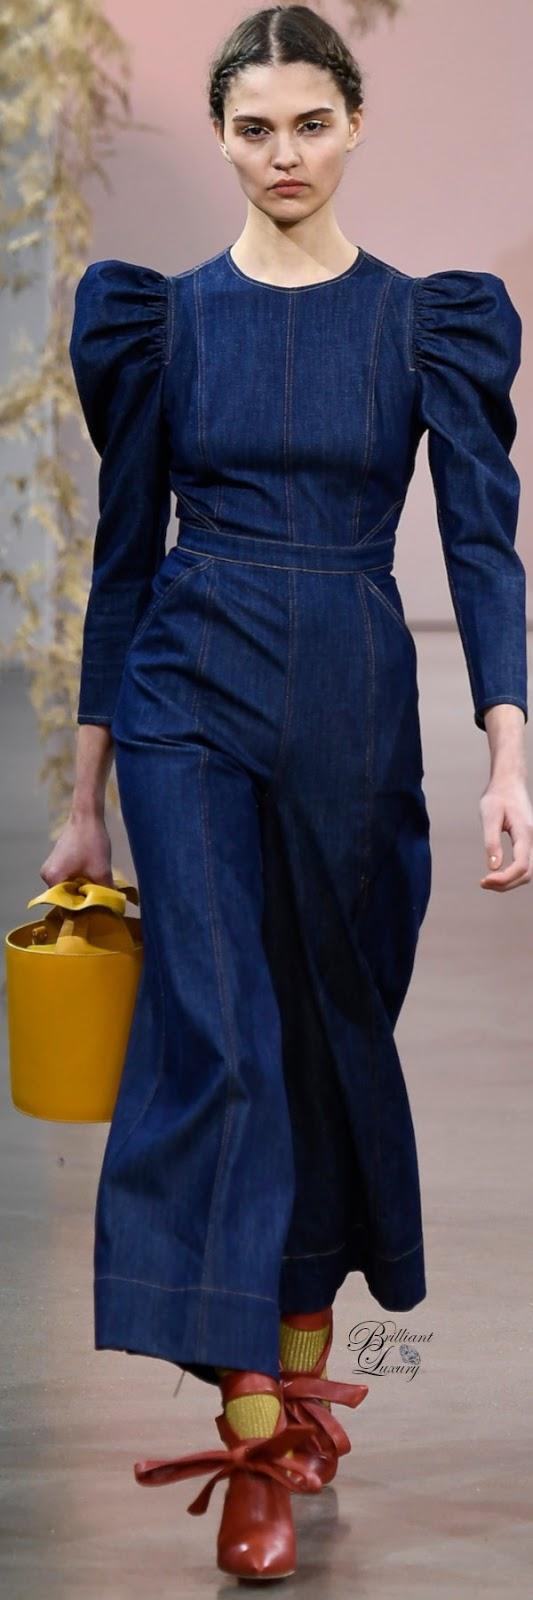 Brilliant Luxury♦Pantone Fashion Color Aspen Gold~bags